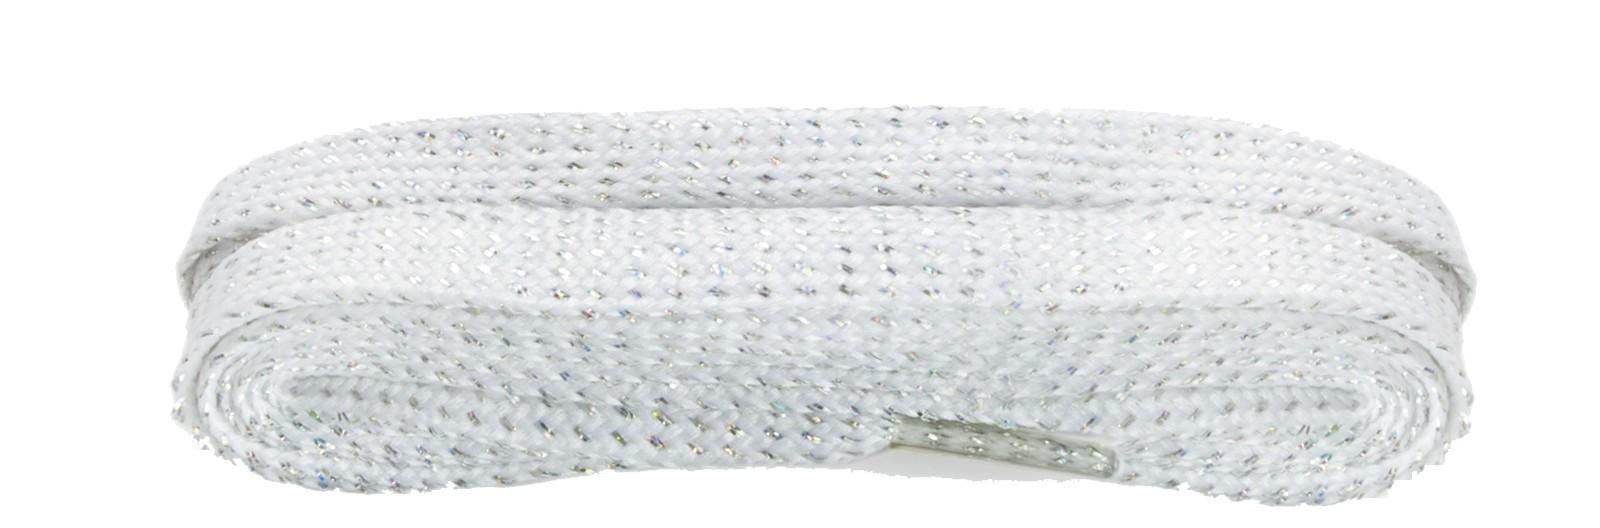 Sneaker Lurex White/silver Sneaker